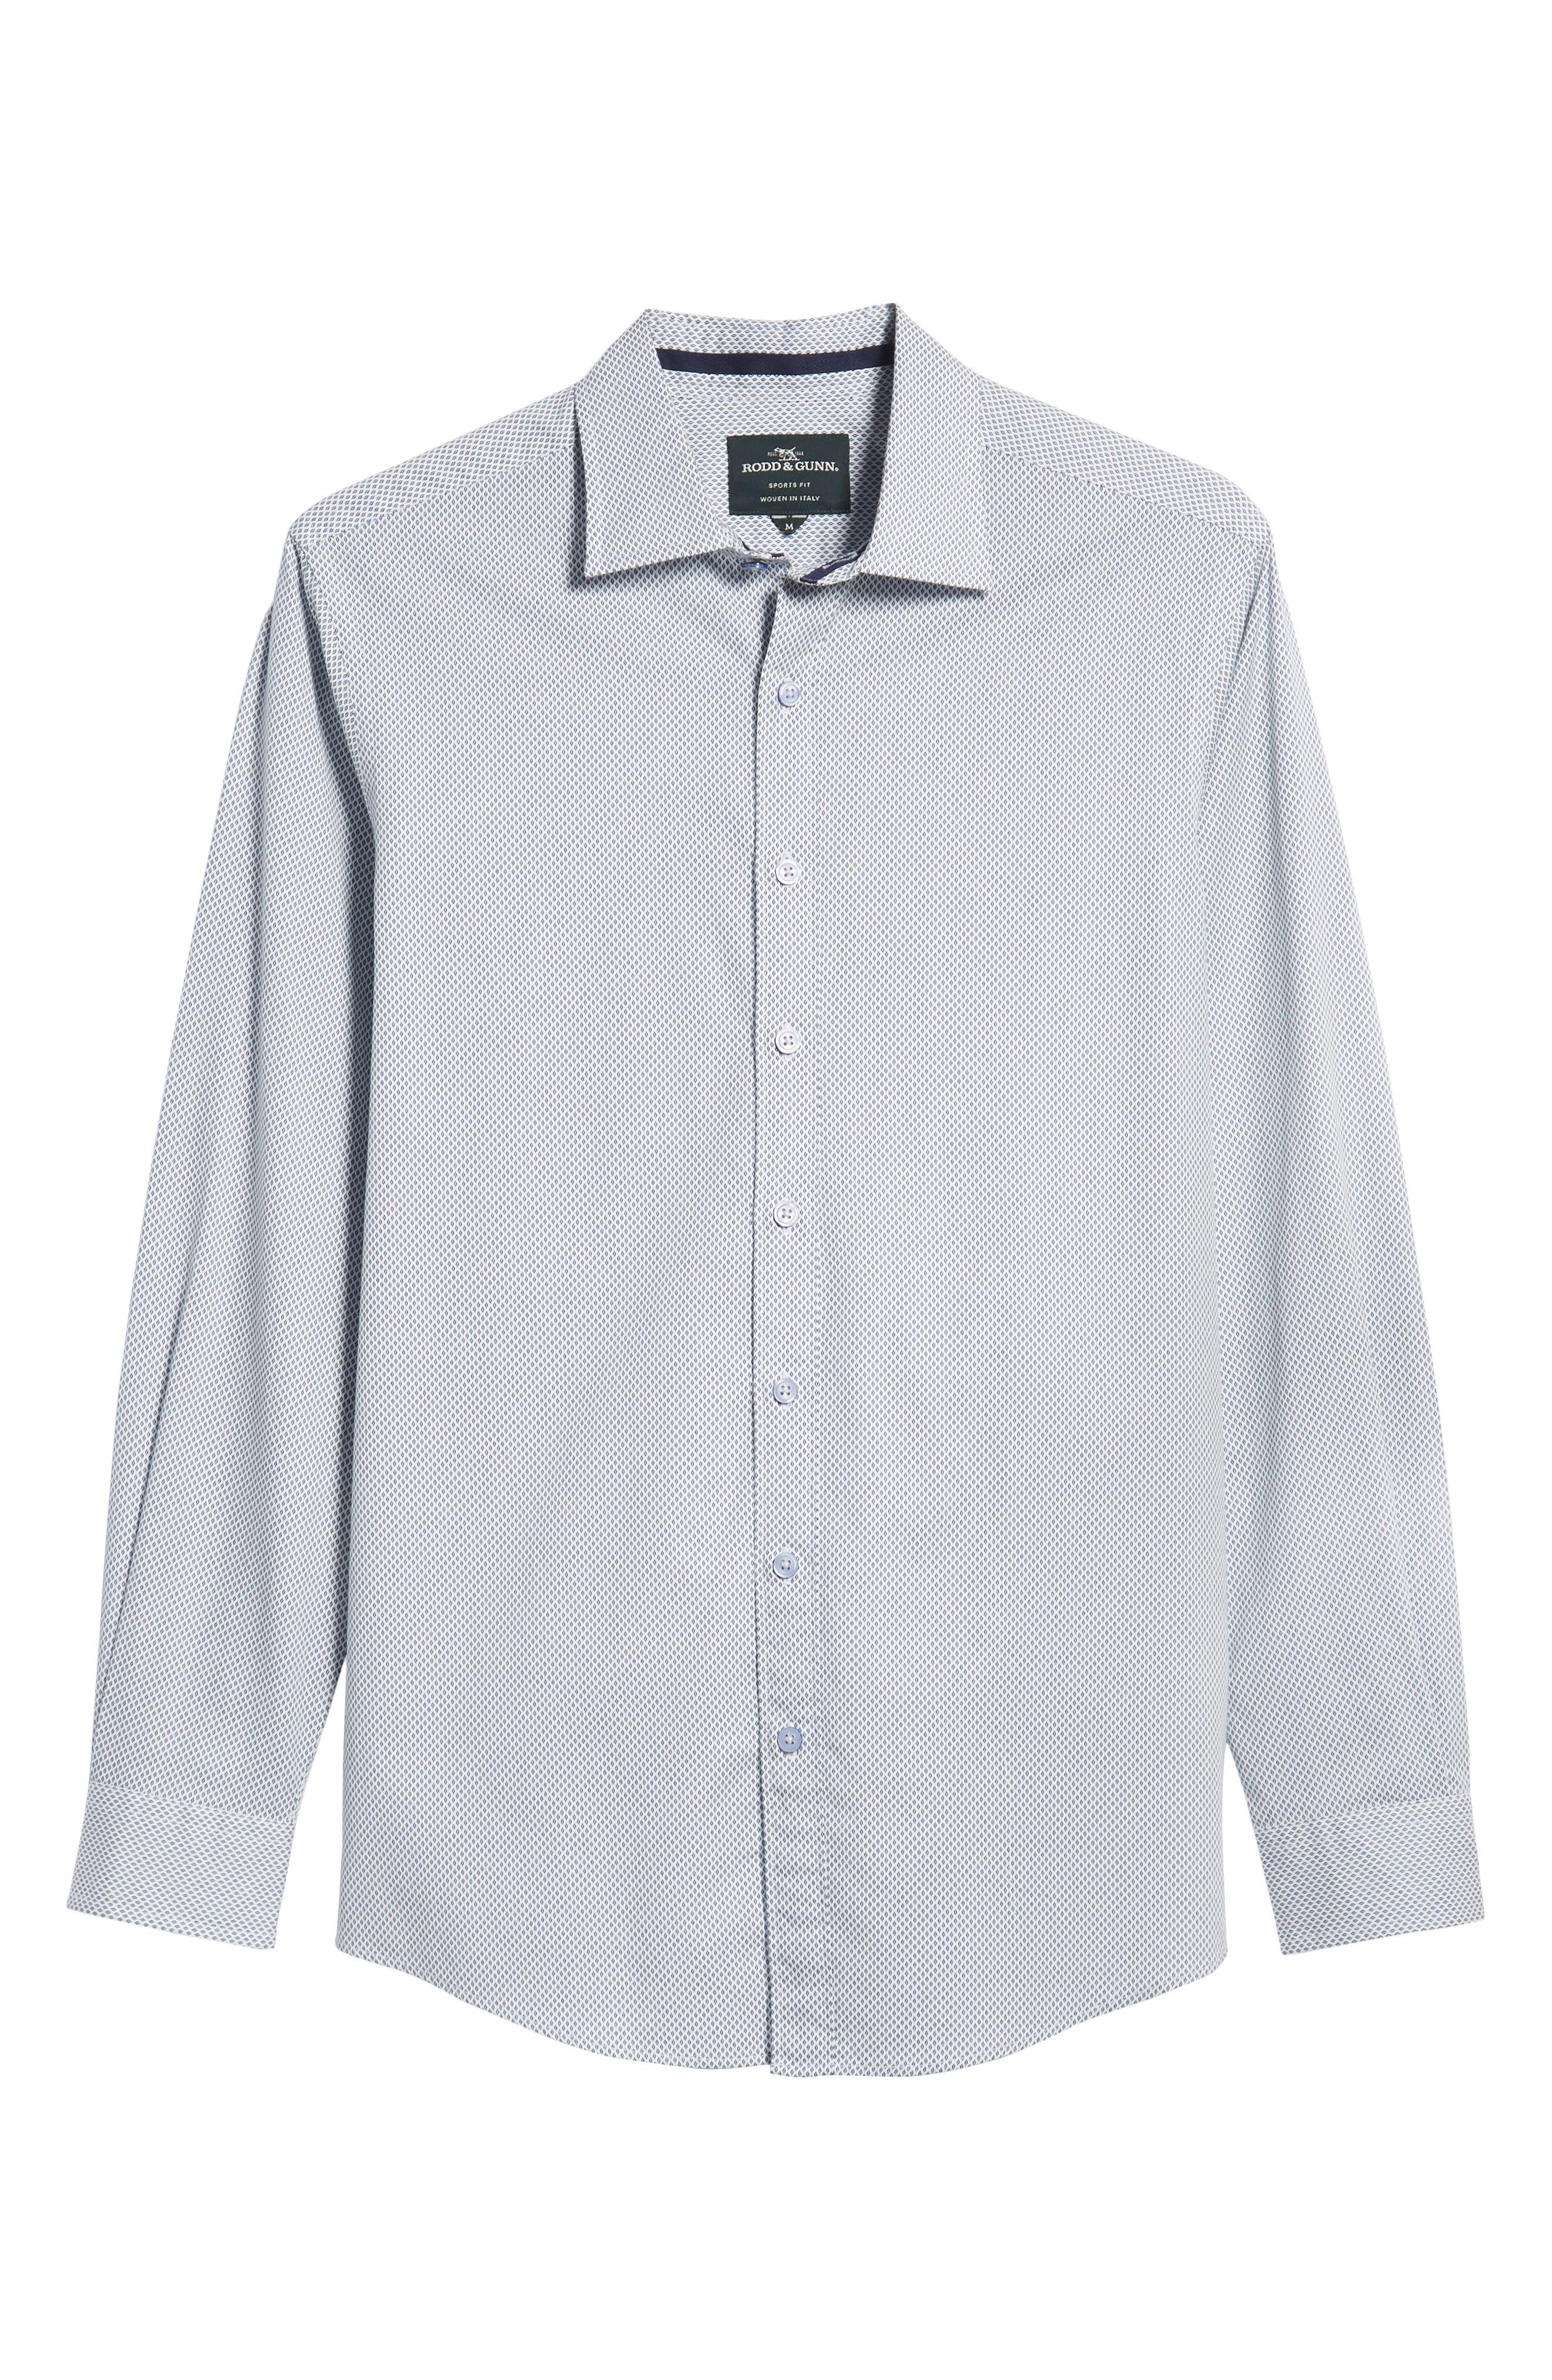 RODD & GUNN, Helston Way Regular Fit Sport Shirt, Alternate thumbnail 5, color, SNOW